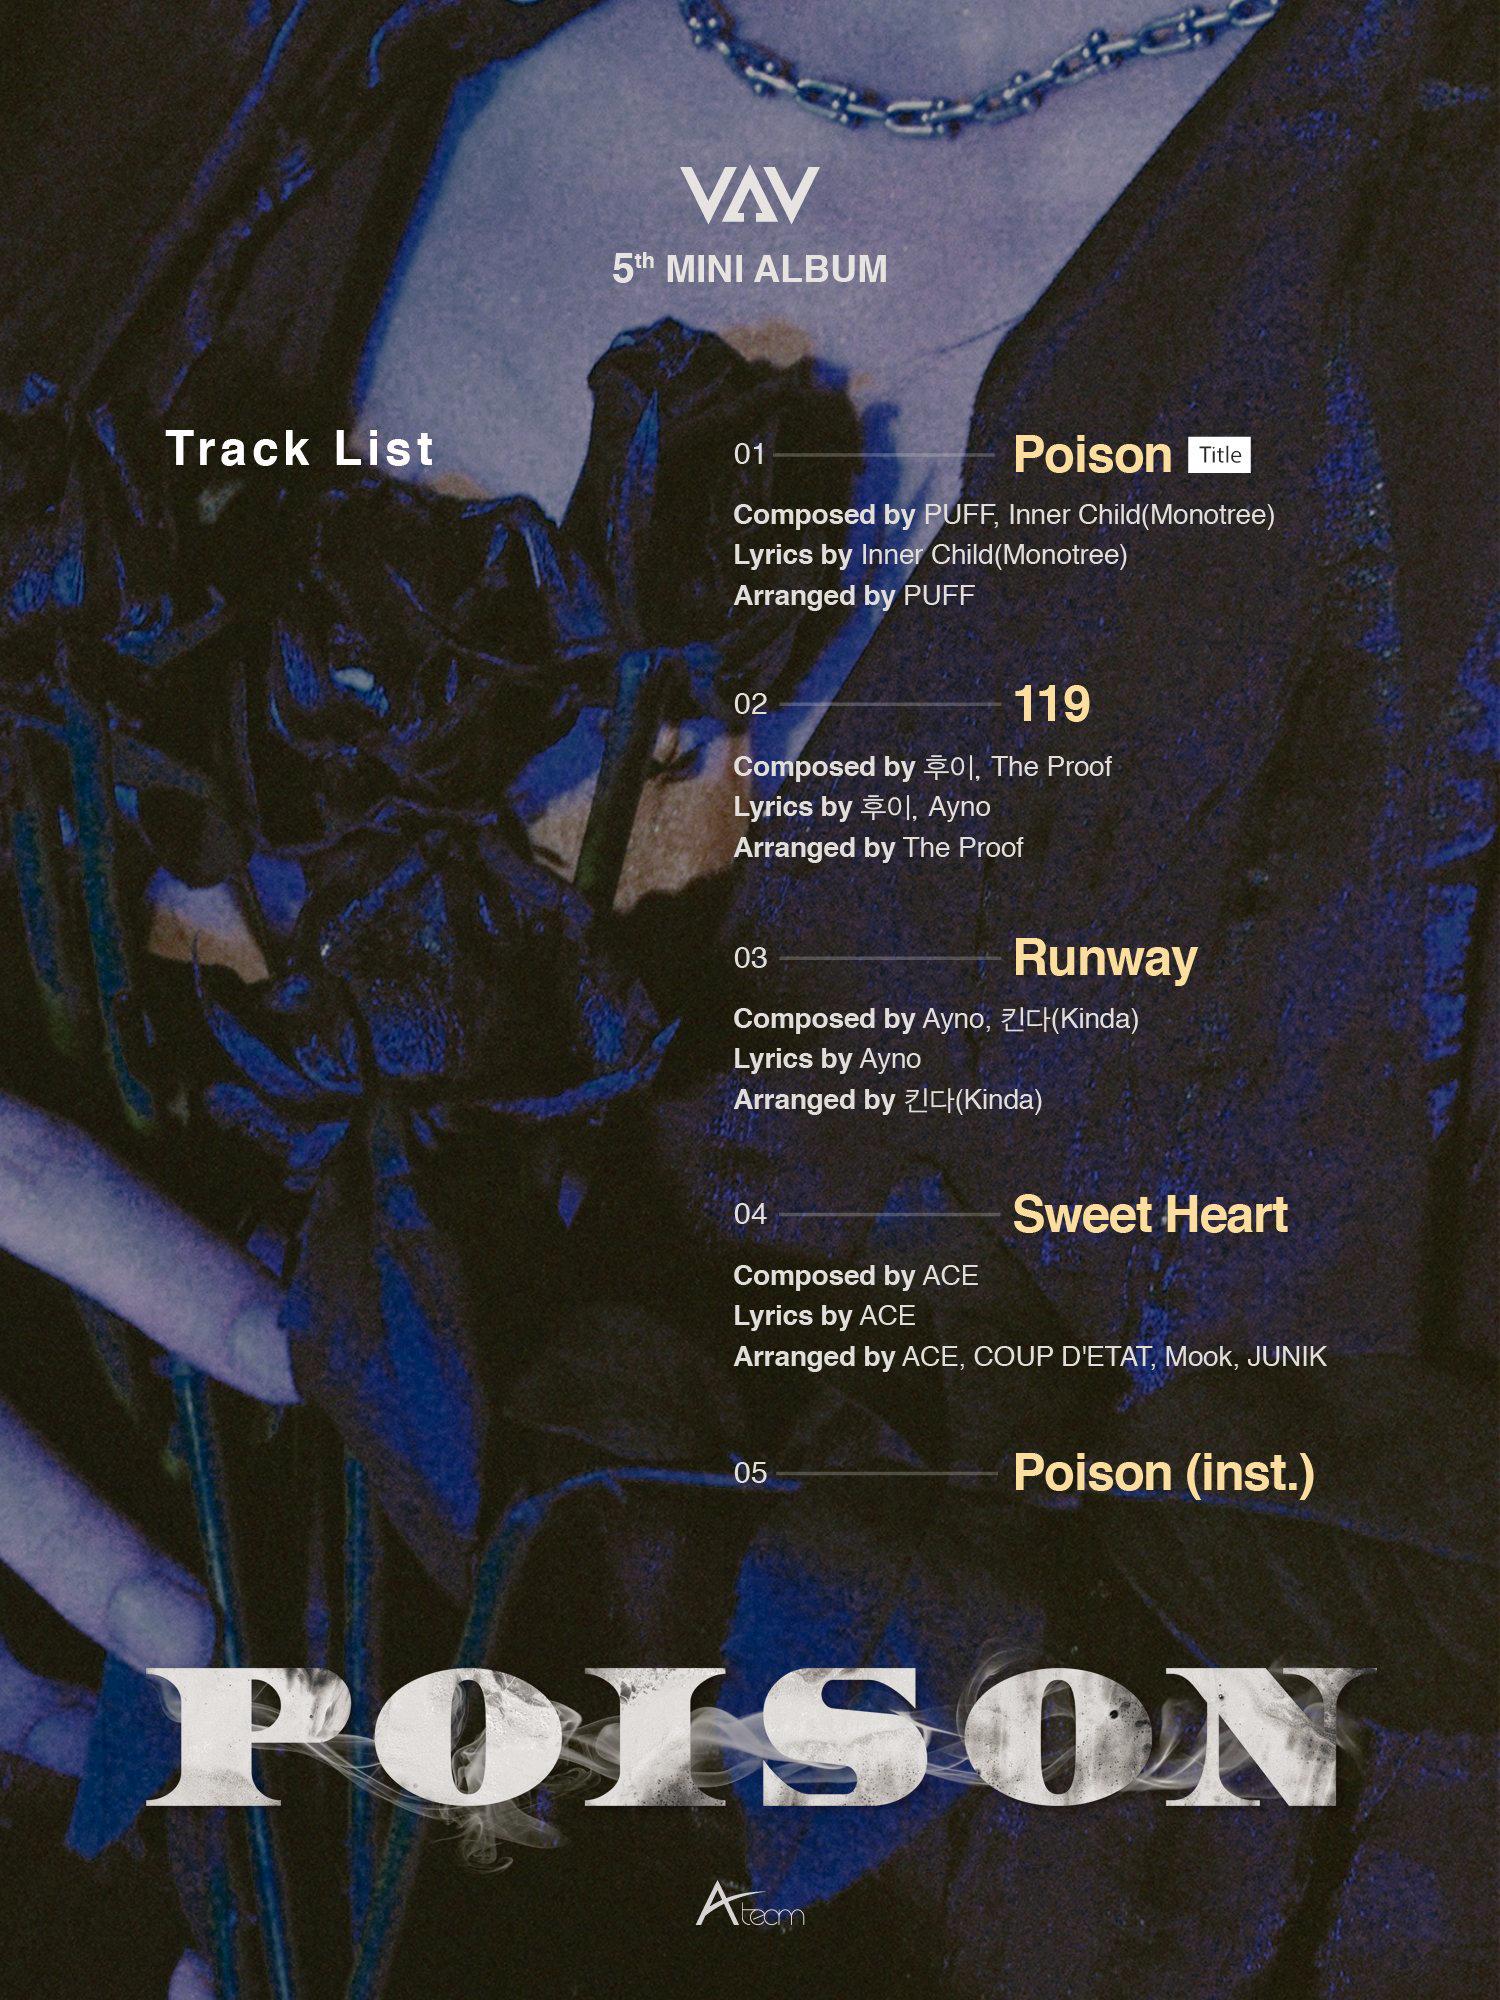 VAV Poison album tracklist.png